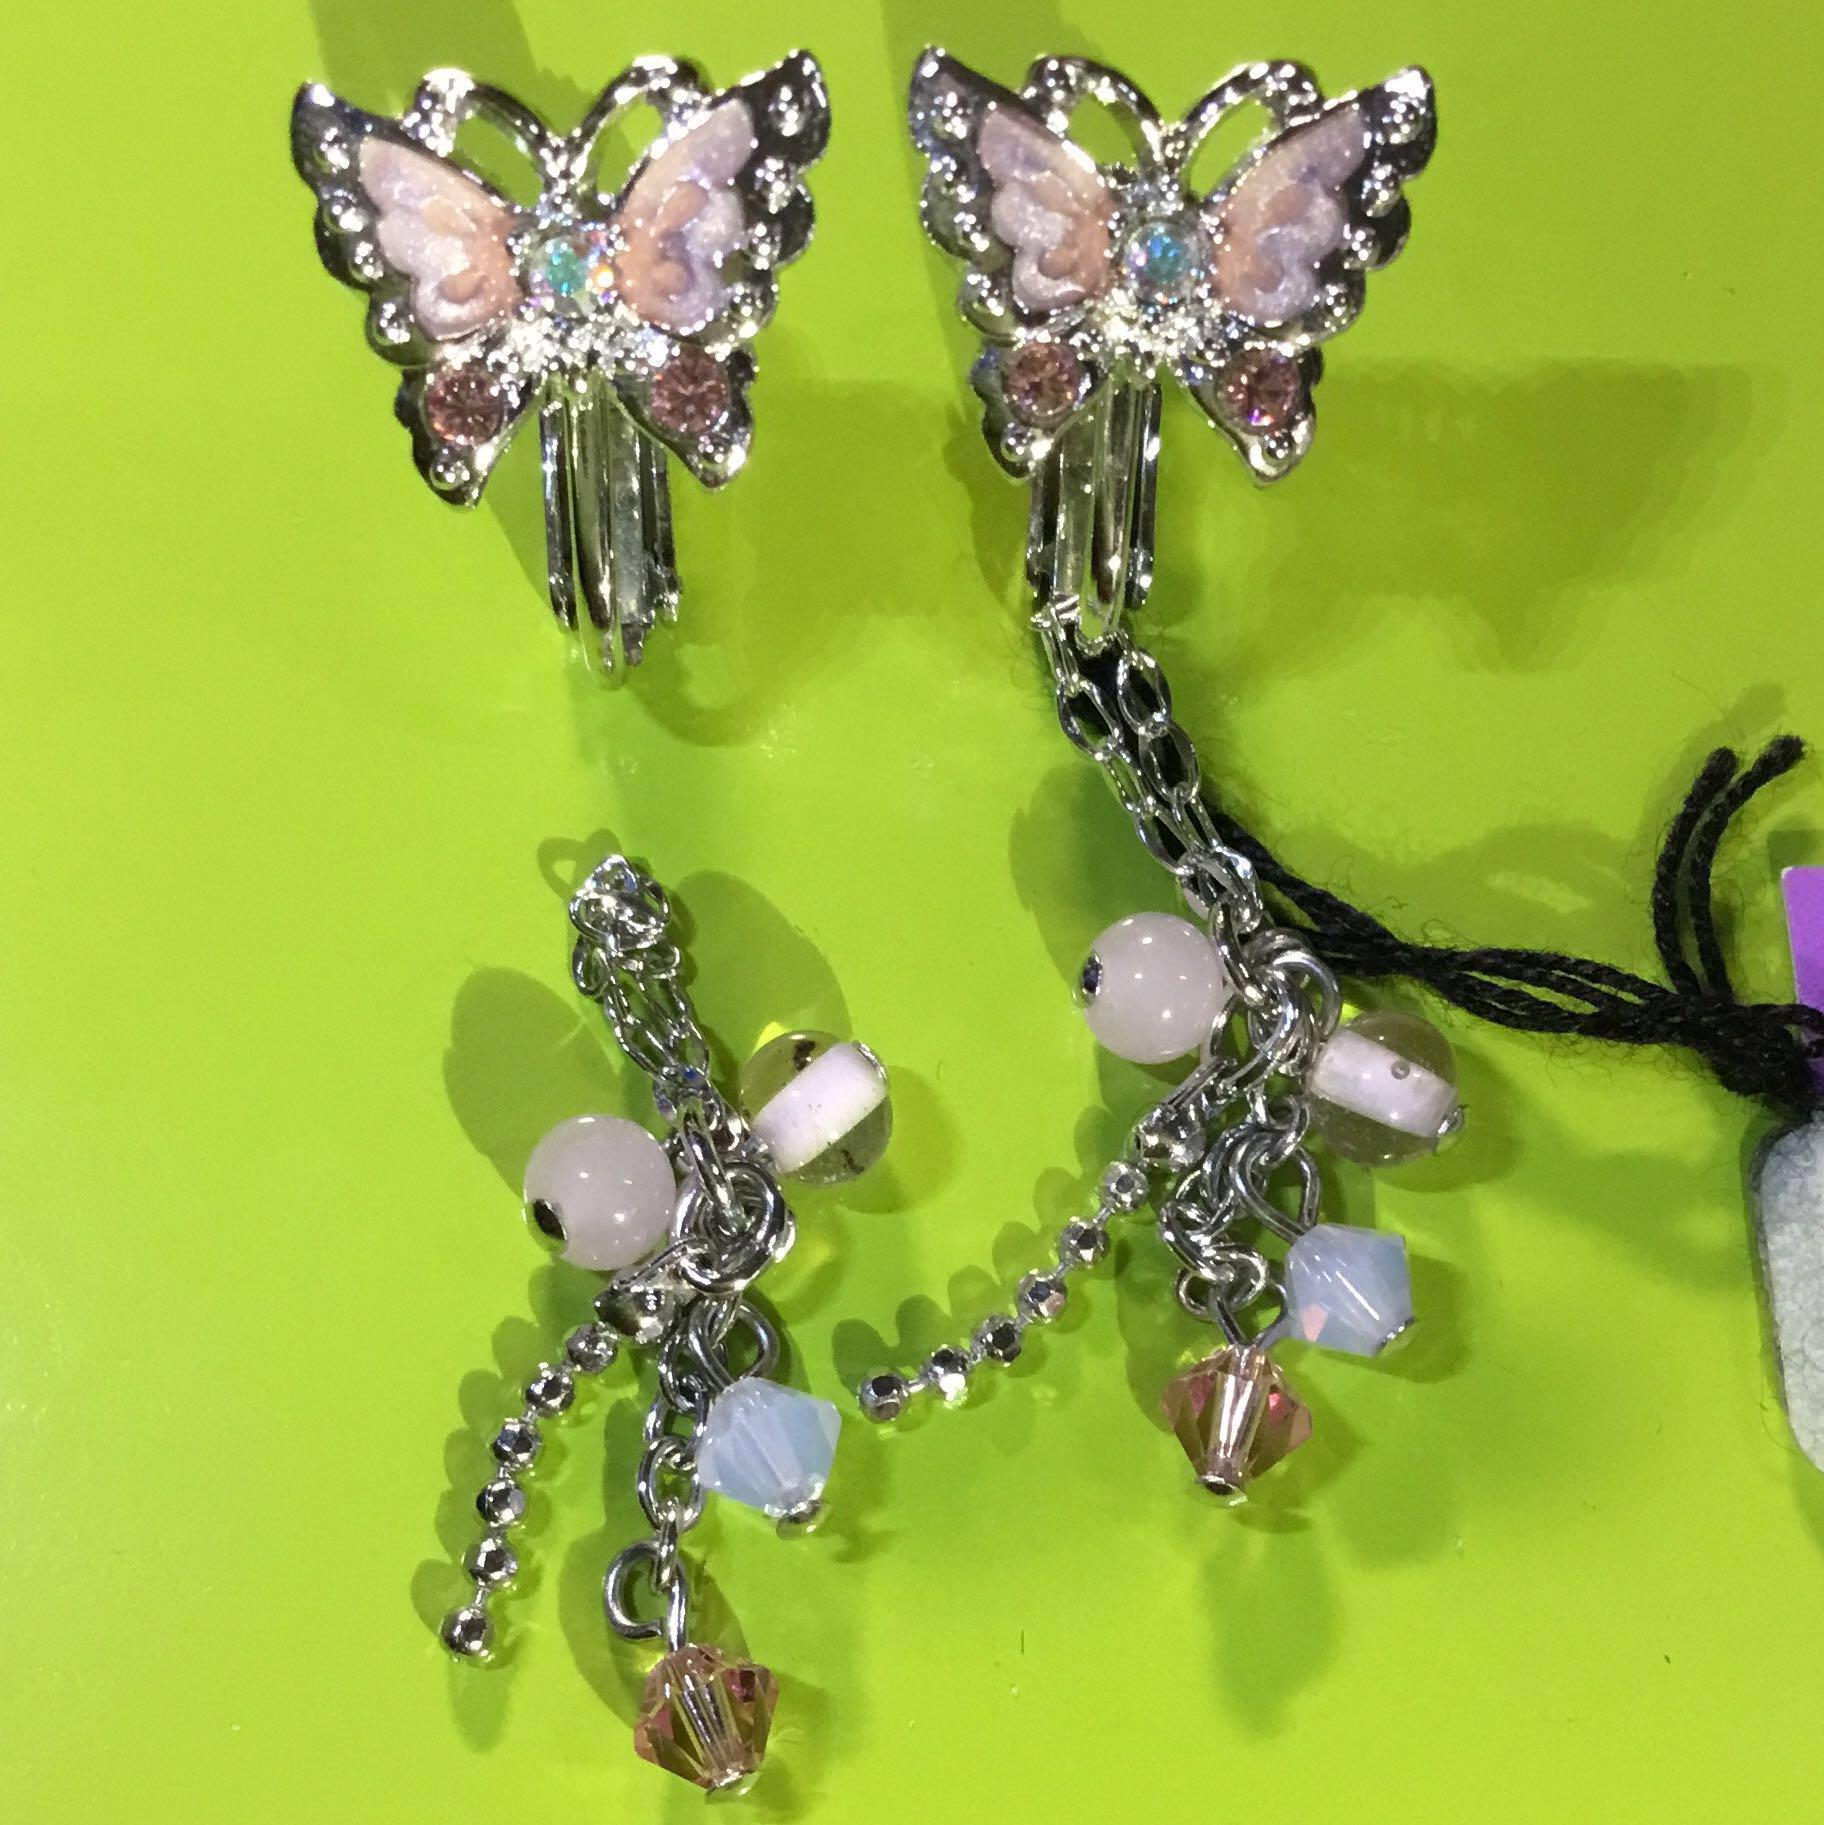 Anna Sui全新限量正品水鑽粉紅色蝴蝶附可拆式粉彩珠珠垂墜吊飾夾式耳環安娜蘇